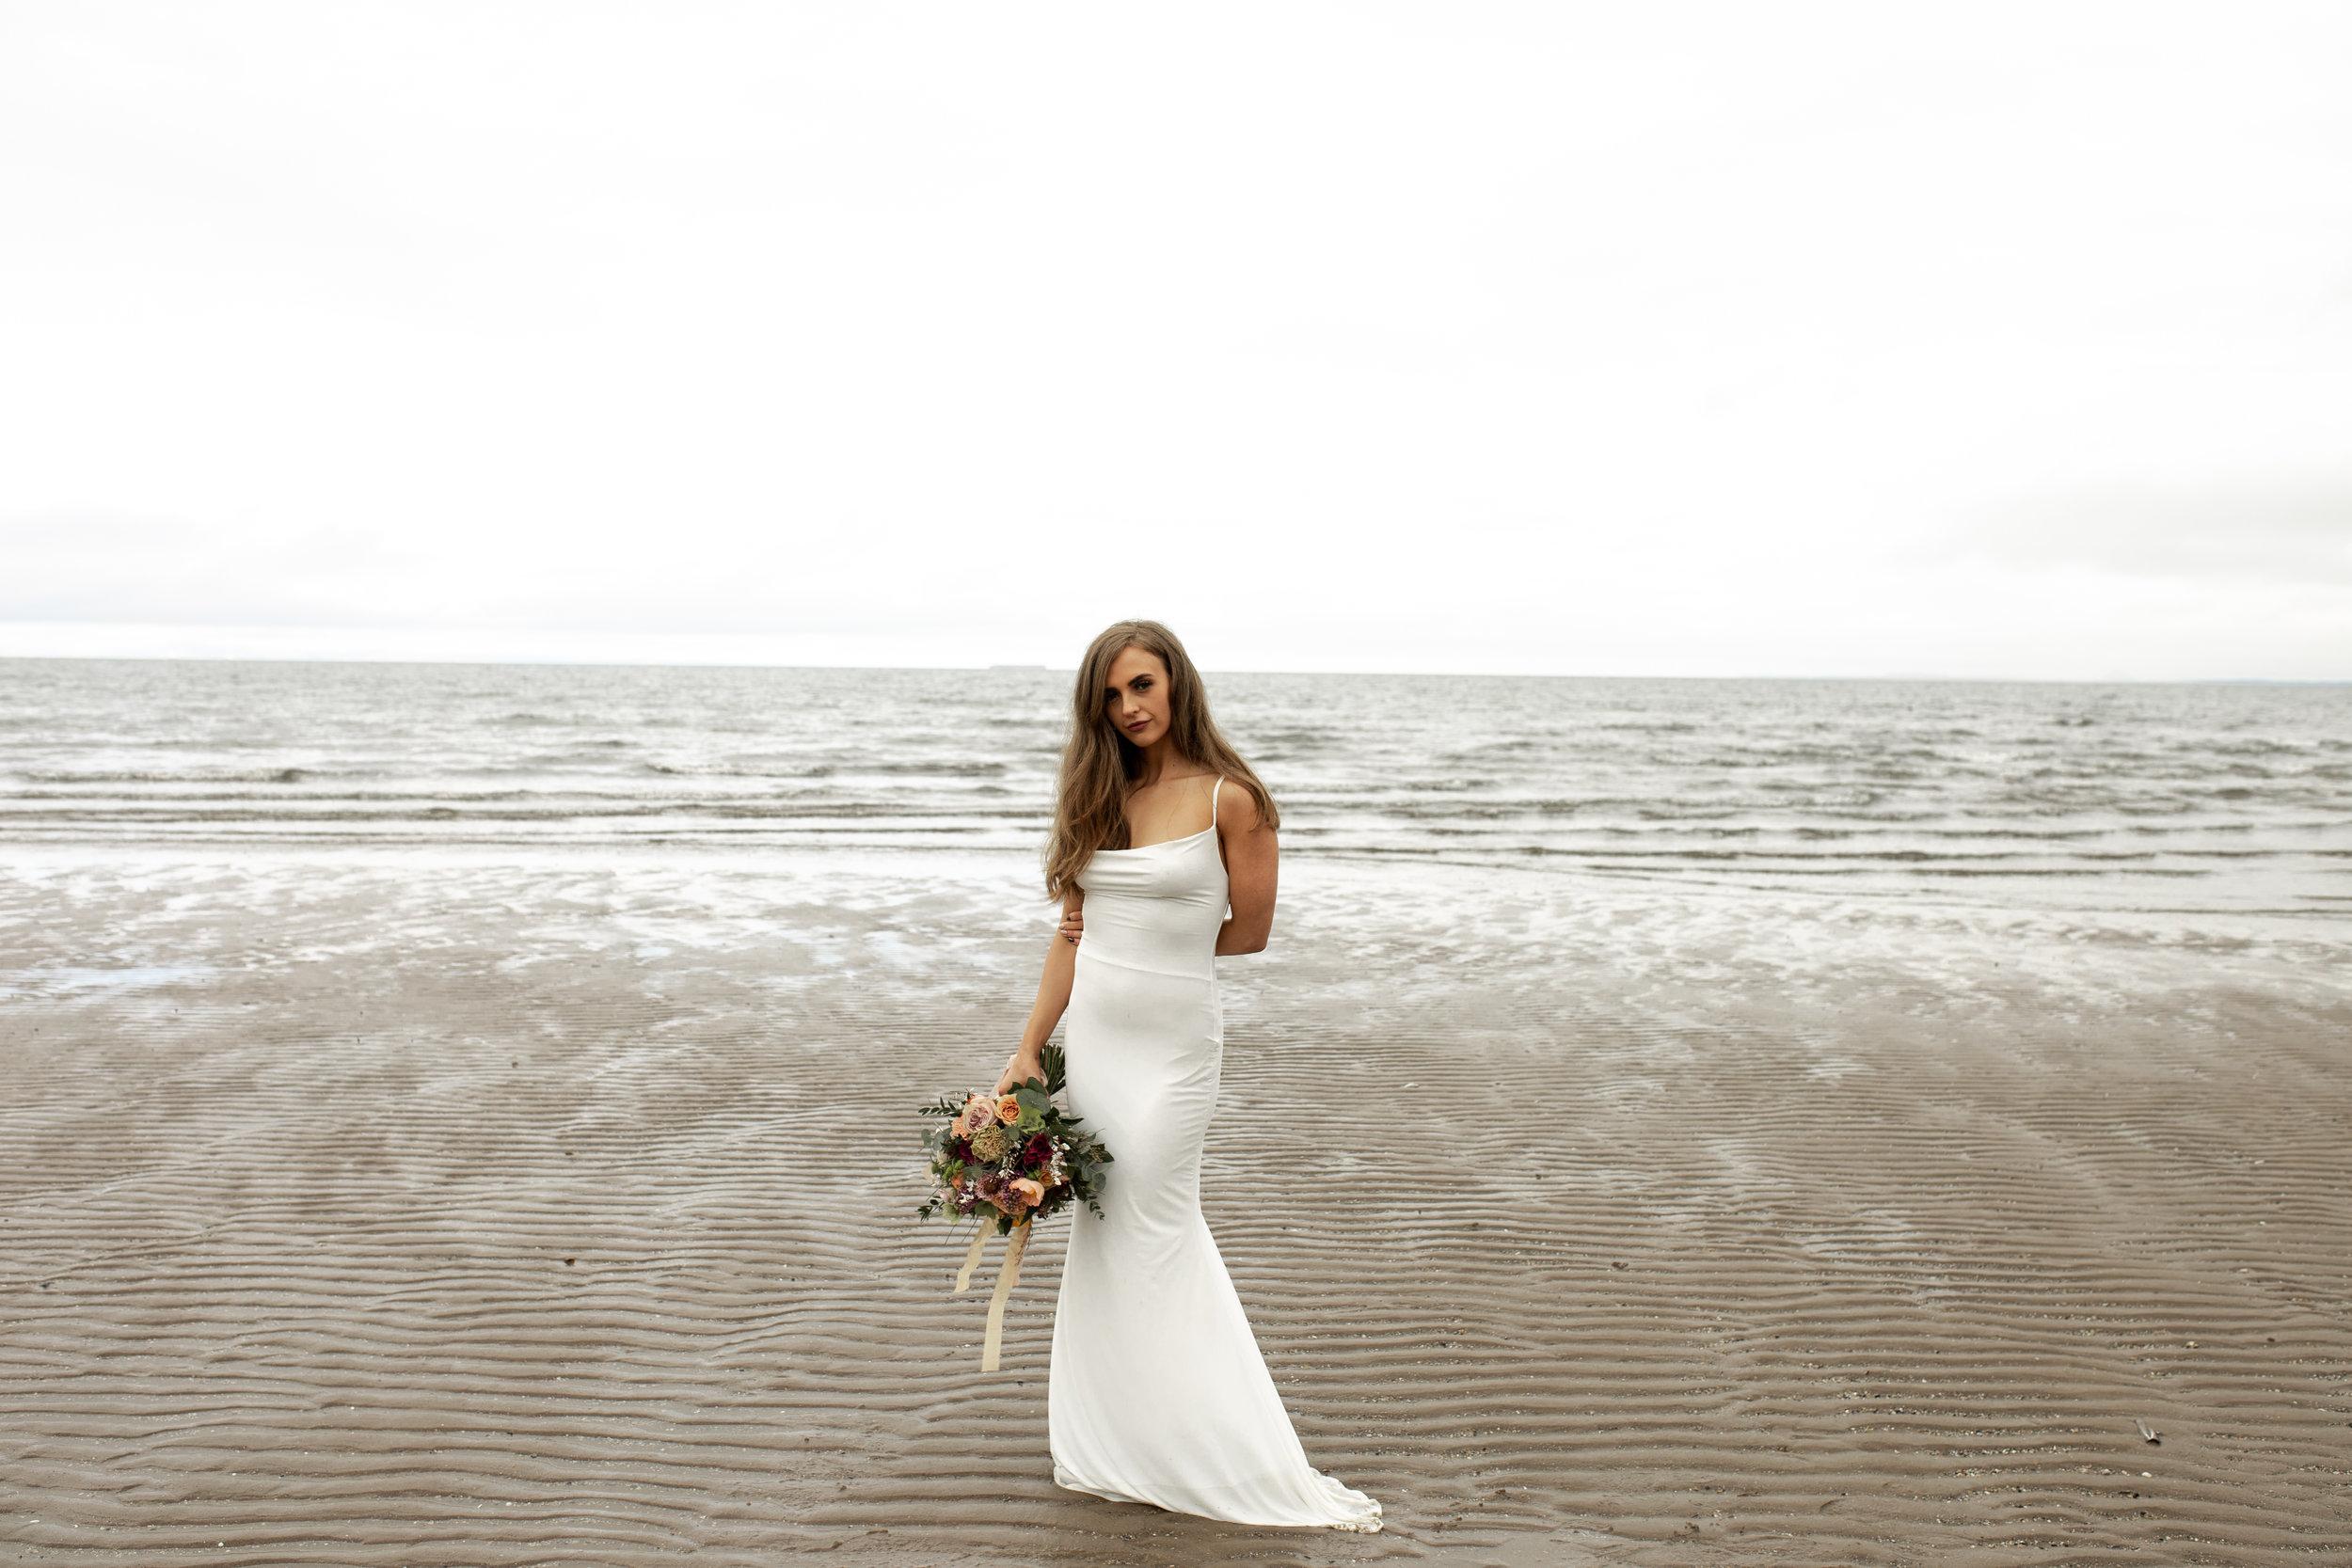 Paula_Russell_Photography_Edinburgh_Wedding_BBonnie_Flowers_9